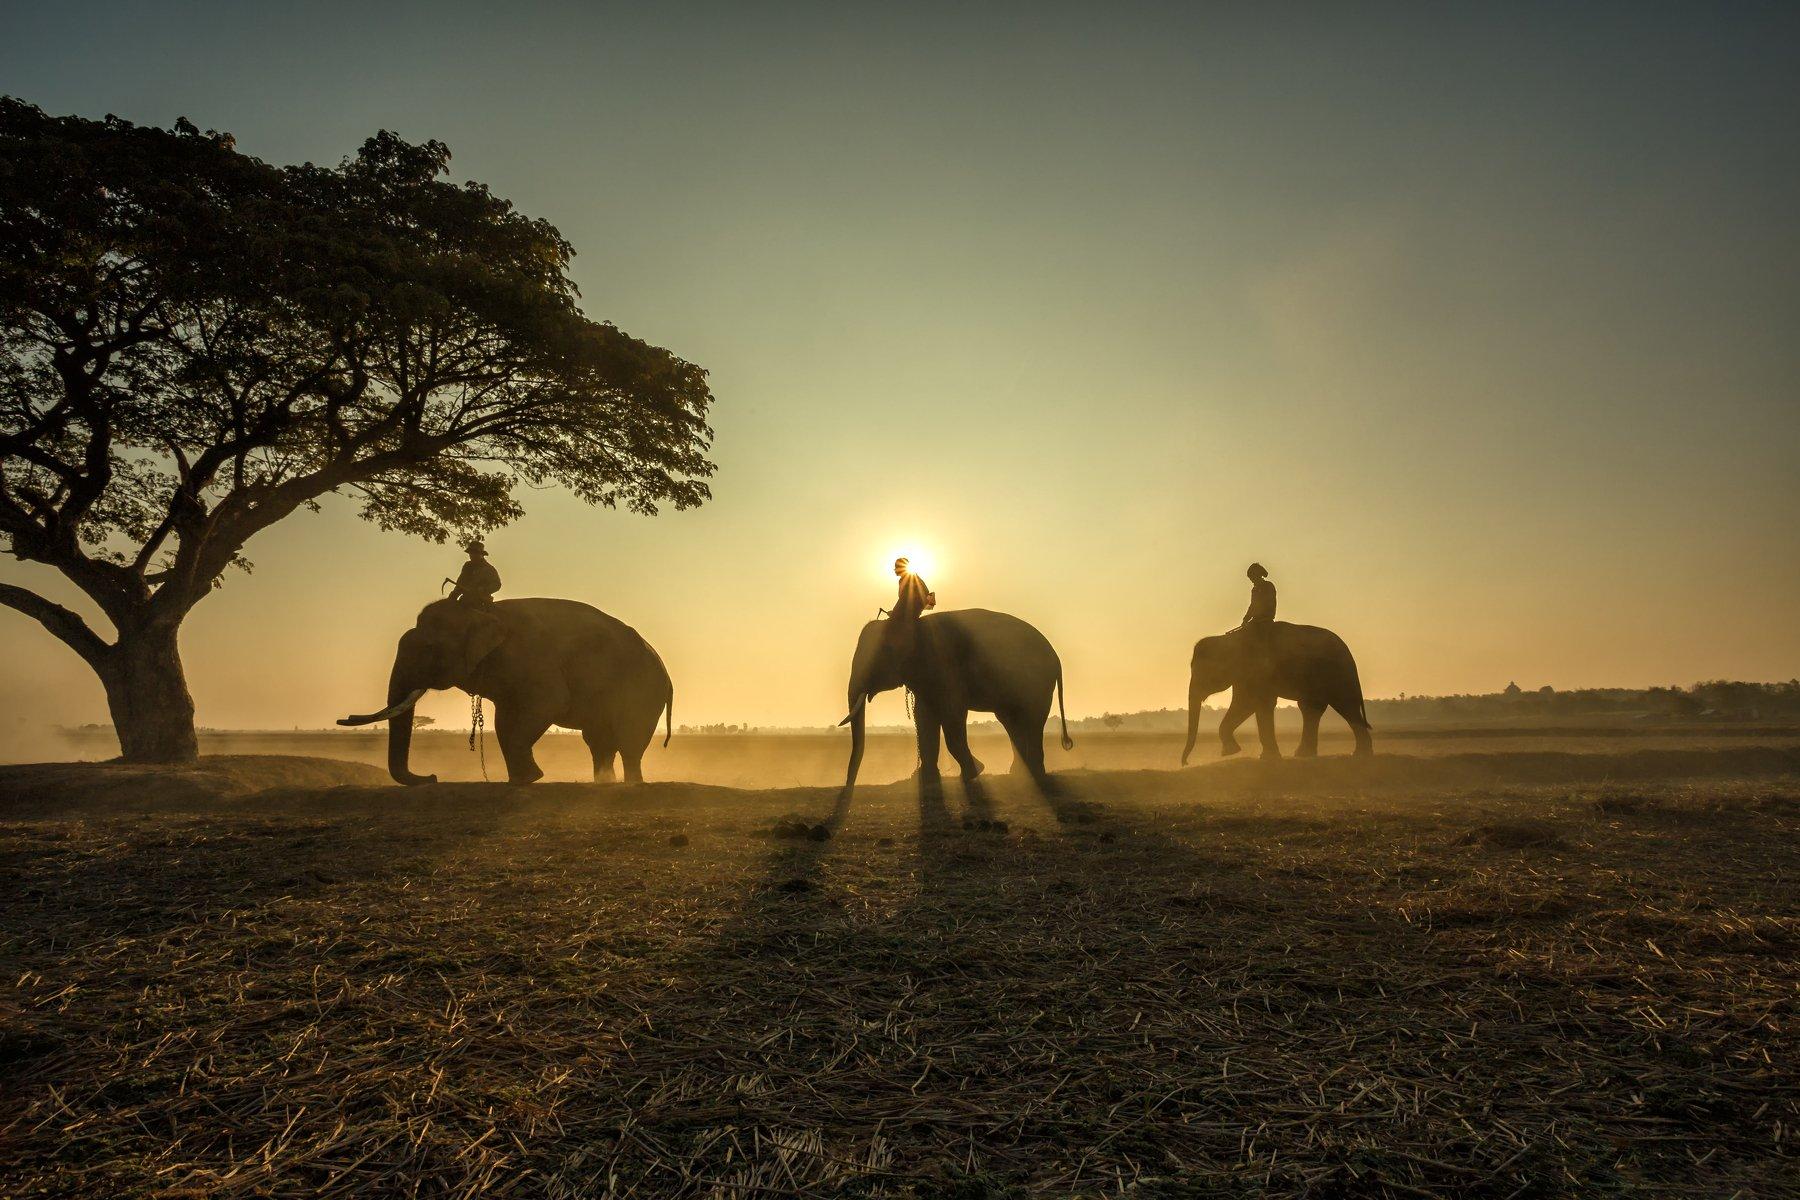 animal,elephant,silhouette,People,safari,asia,, SUTIPORN SOMNAM